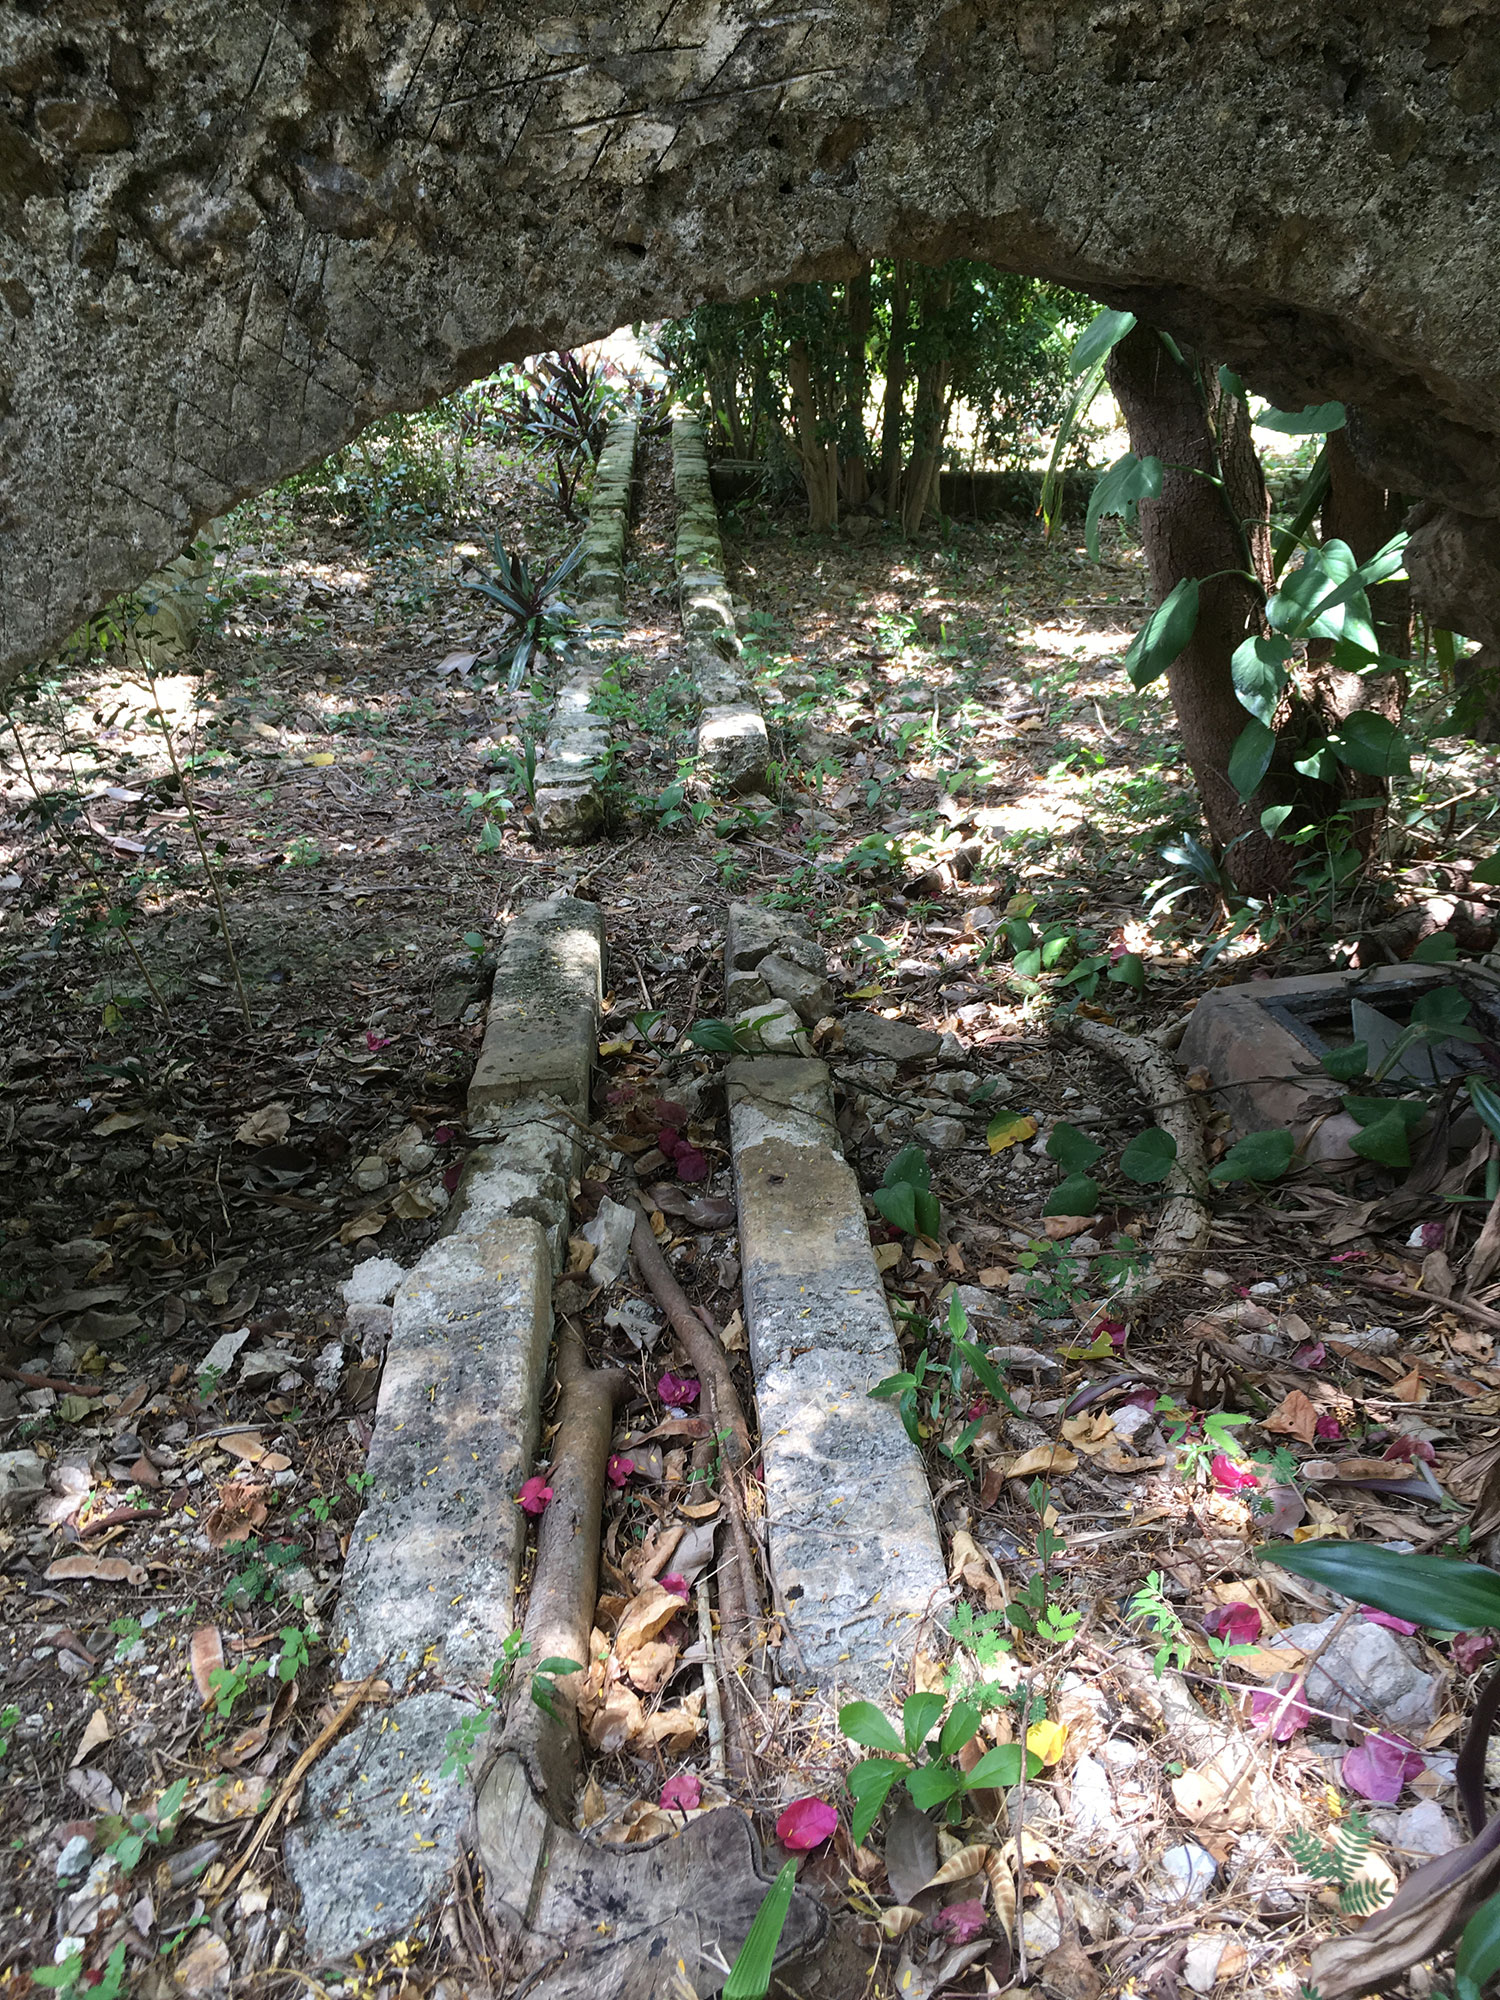 Hammocks_and_Ruins_Mayan_Mythology_What_to_Do_Mexico_Maya_hacienda_san_jose_cholul_33.jpg